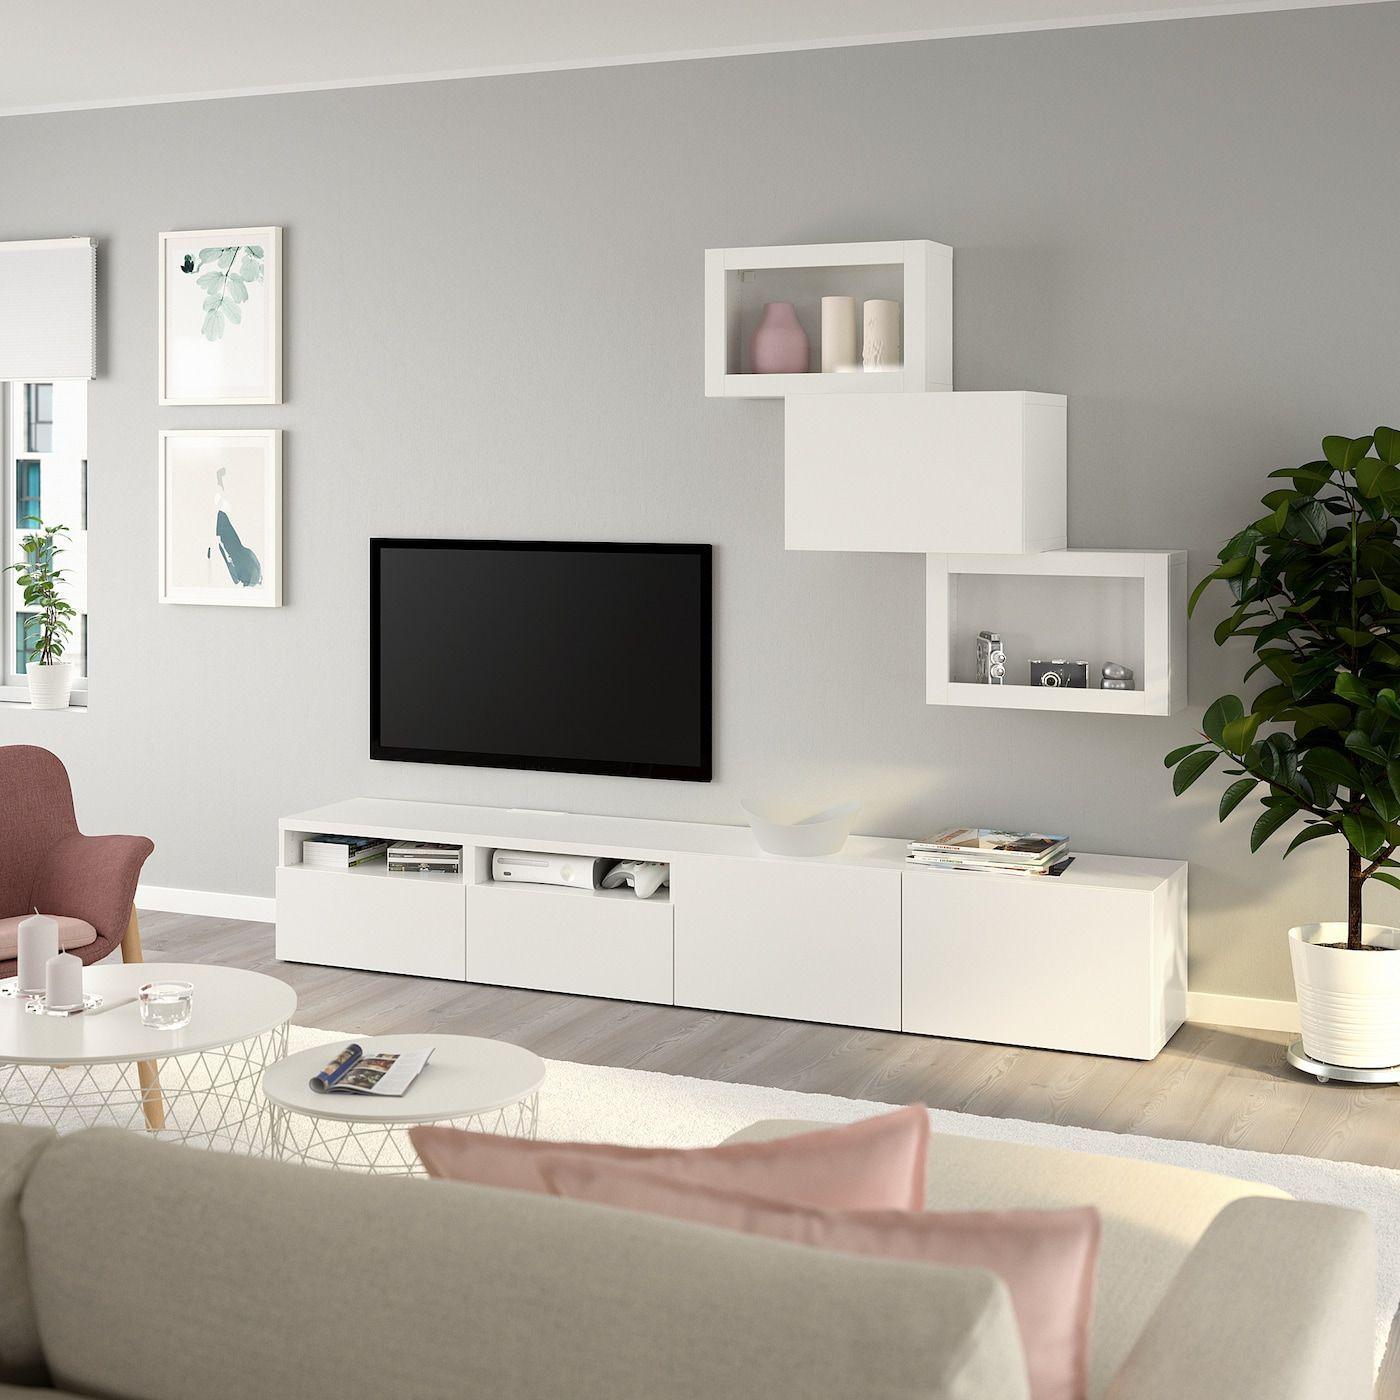 Besta Tv Komb Mit Vitrinenturen Weiss Lappviken Klarglas Weiss Ikea Osterreich En 2020 Deco Moderne Salon Deco Meuble Tele Meuble Living